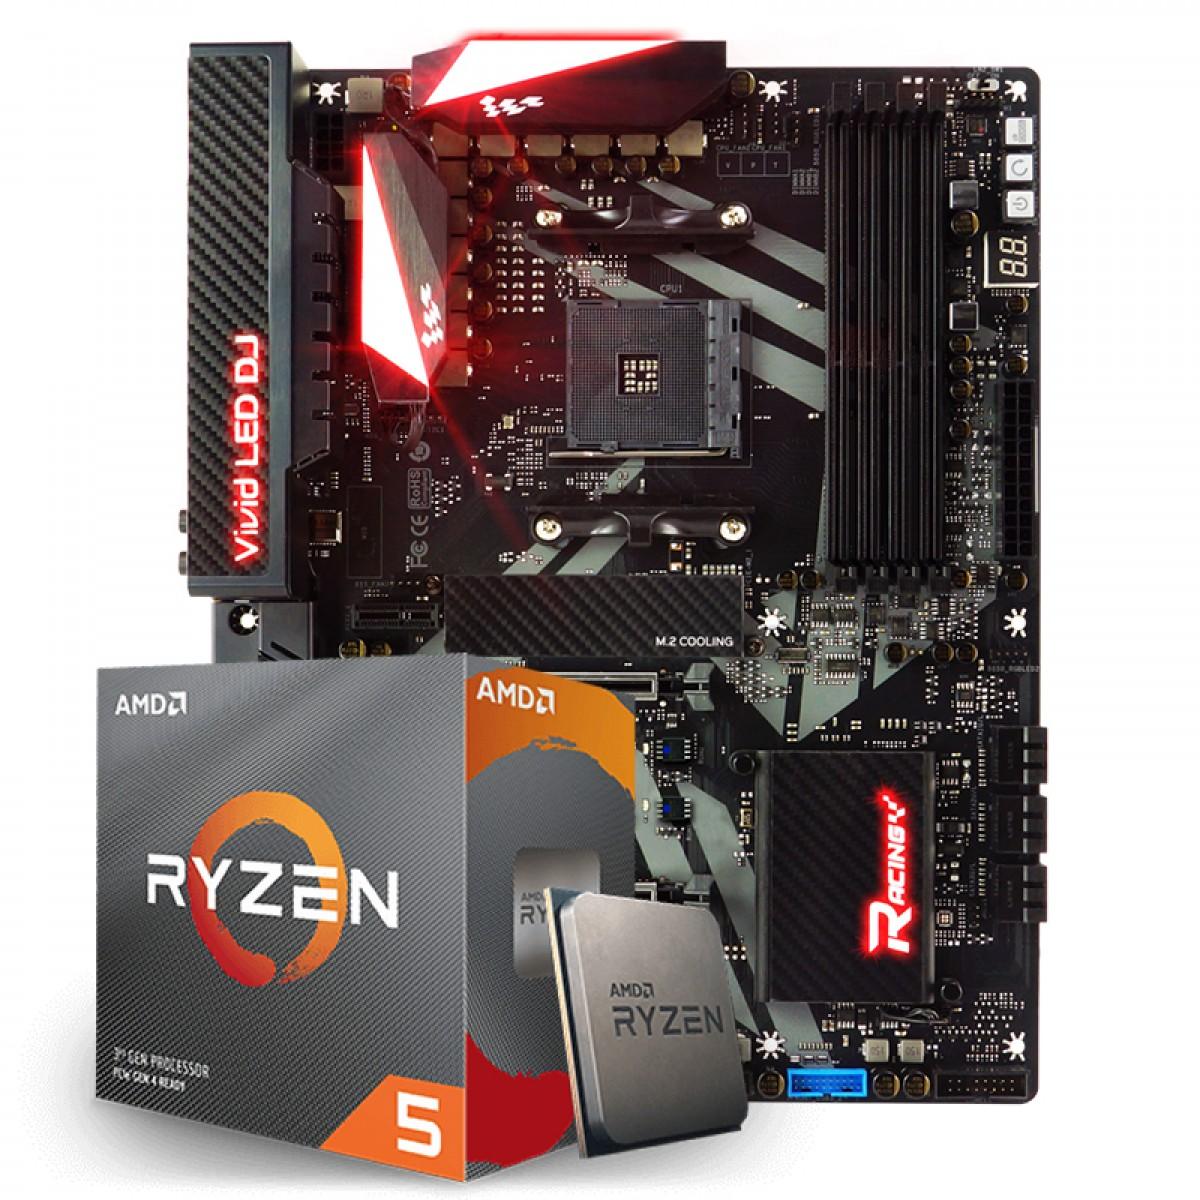 Kit Upgrade Placa Mãe Biostar Racing X470GT8, AMD AM4 + Processador AMD Ryzen 5 3600x 3.8ghz